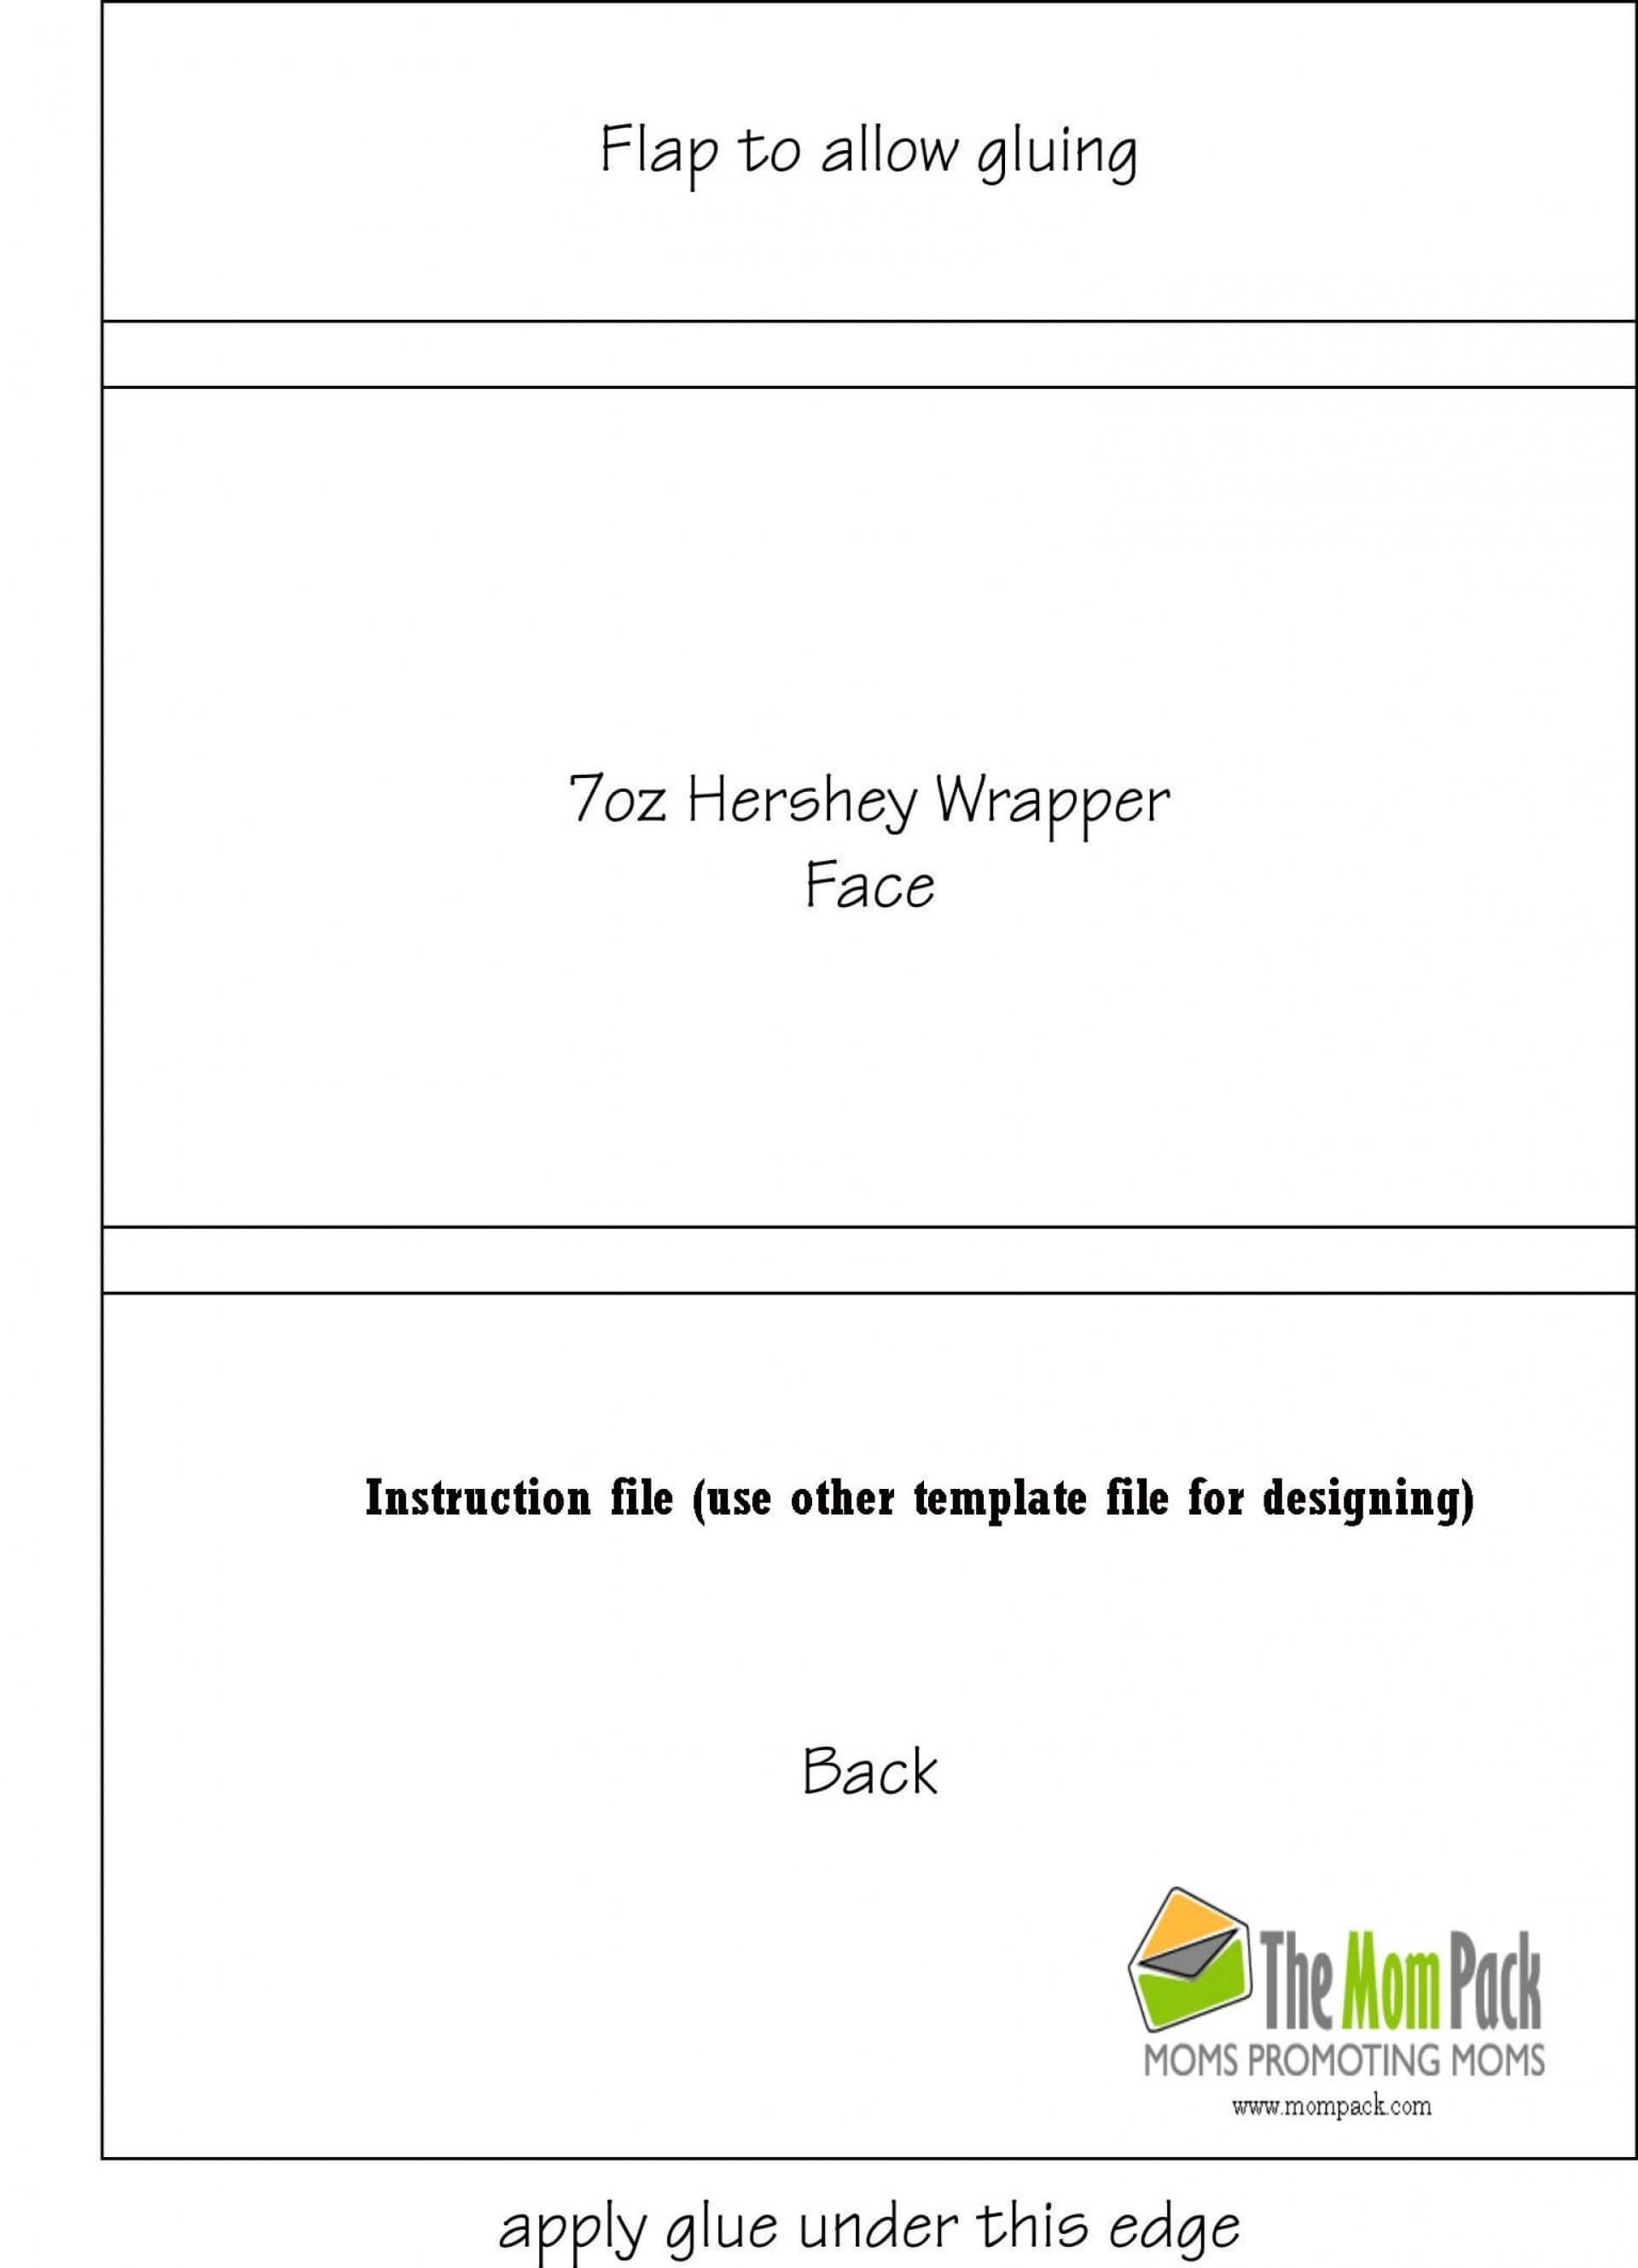 019 Candy Bar Wrapper Template Ideas Stunning Free Blank For intended for Free Blank Candy Bar Wrapper Template